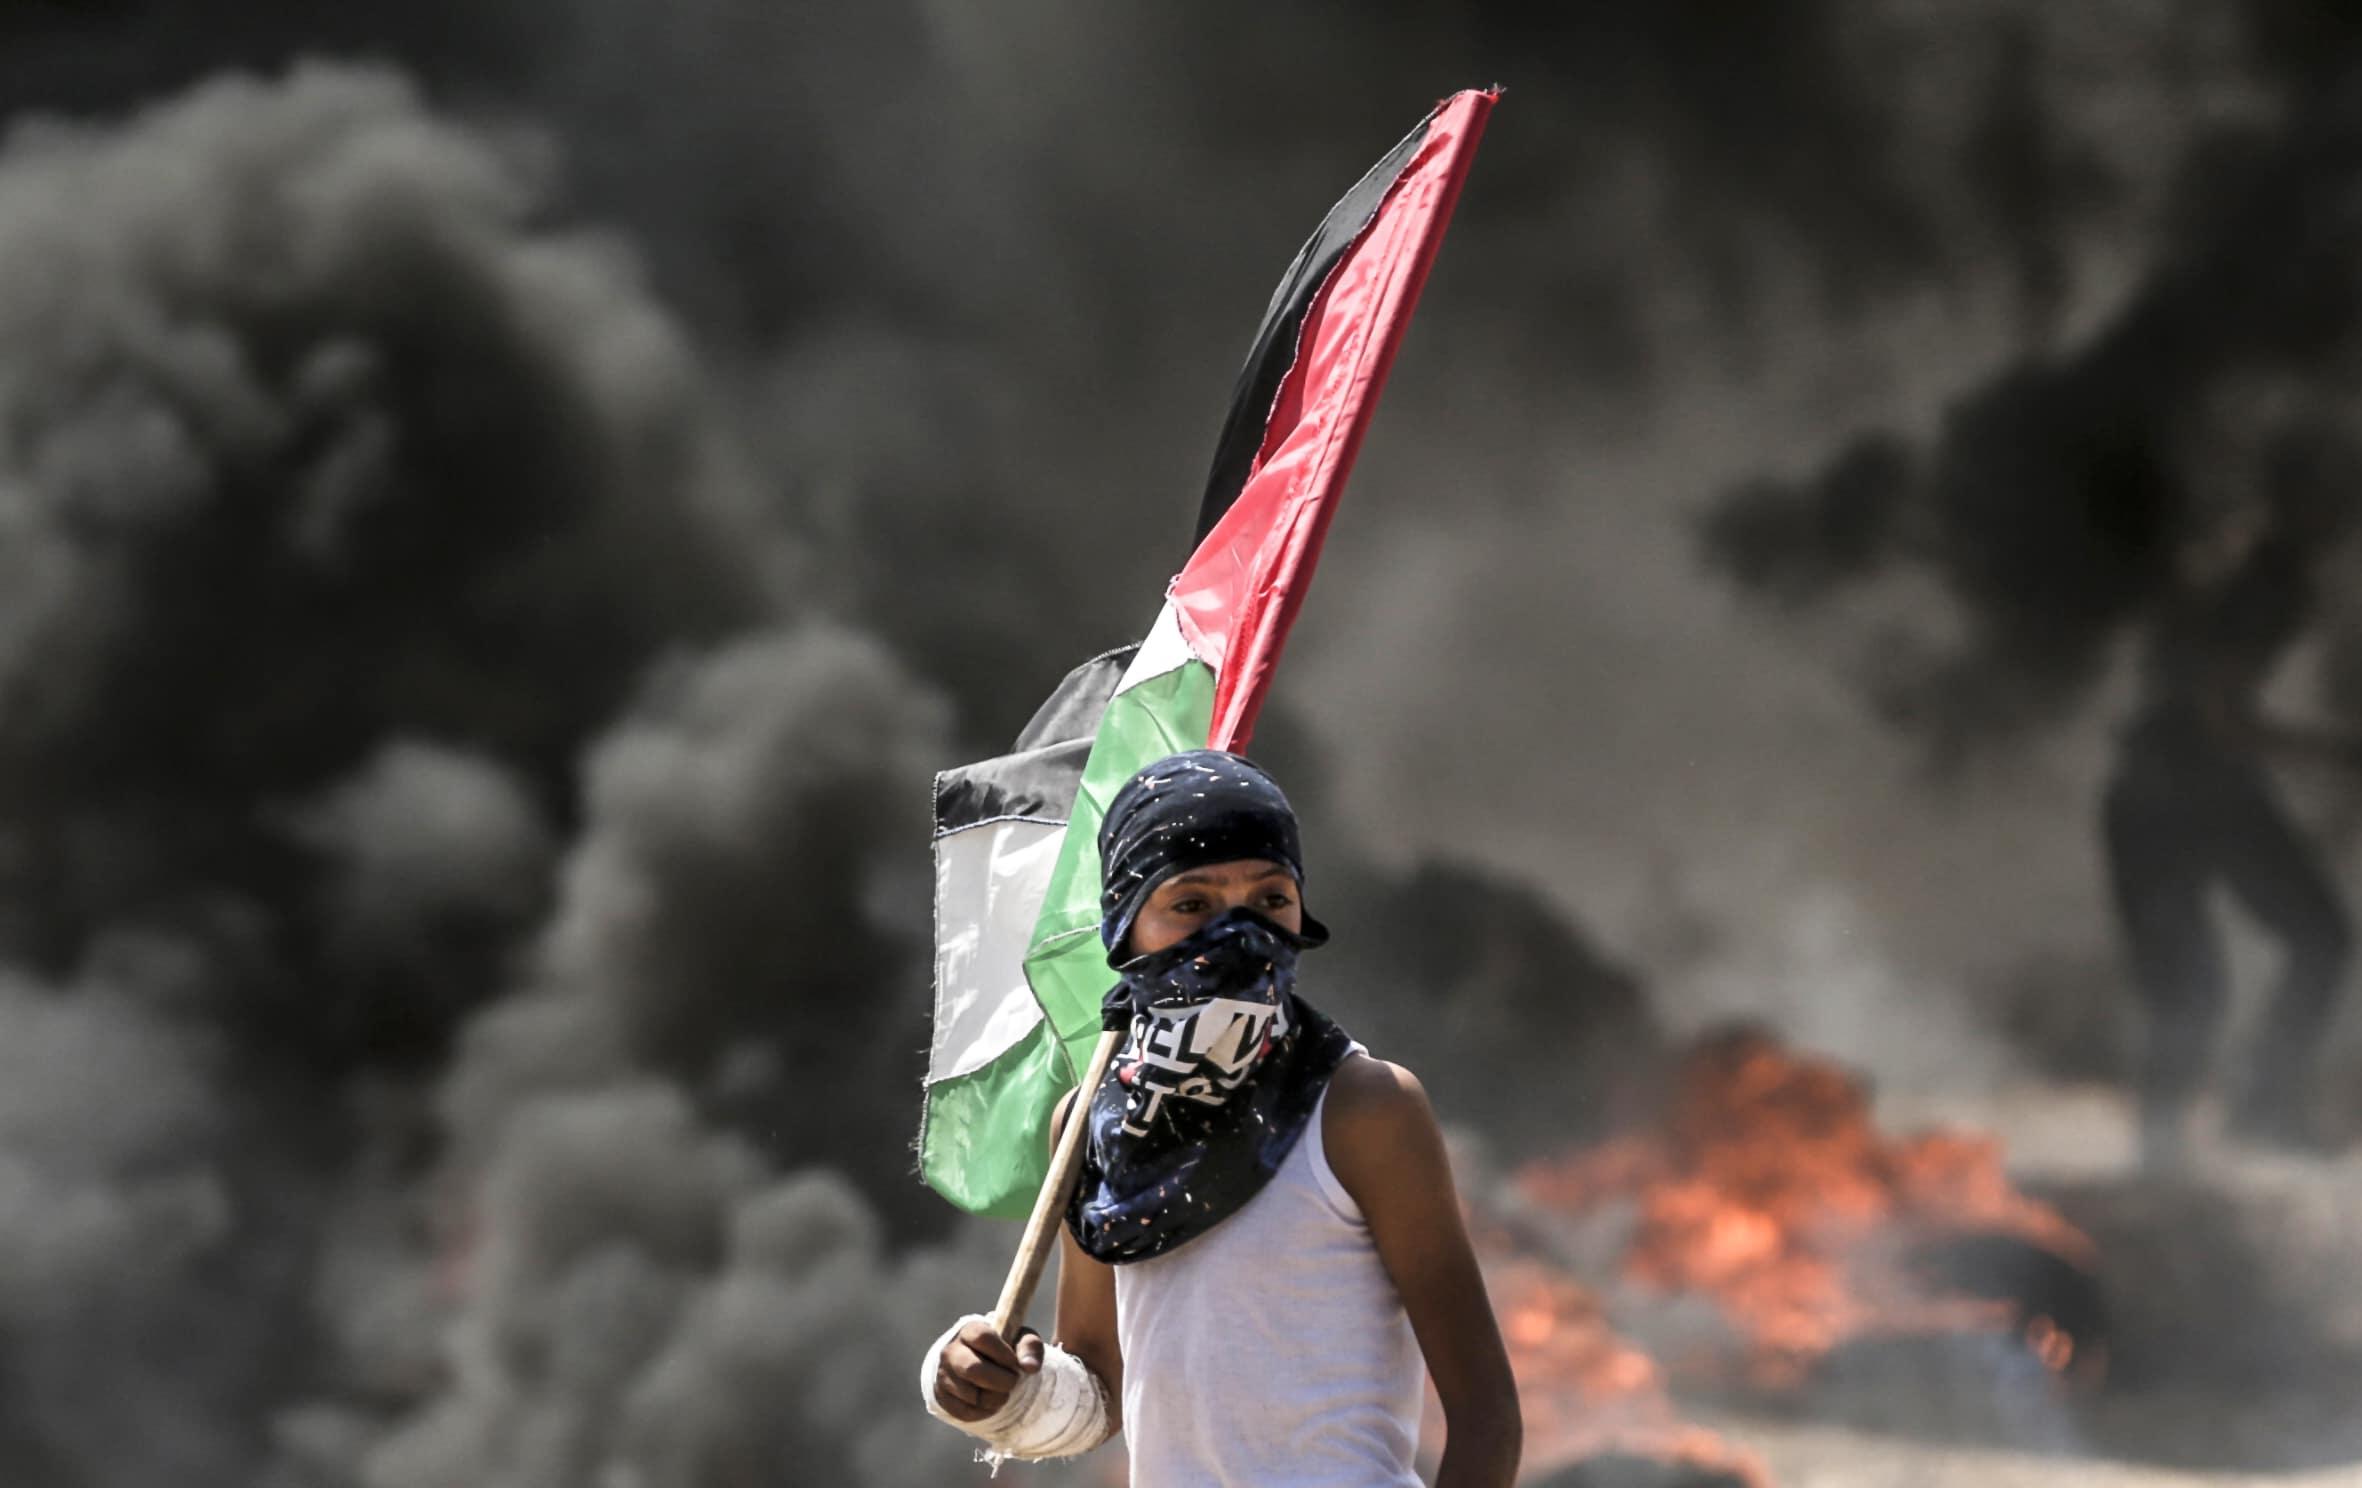 ambasciata gerusalemme scontri gaza